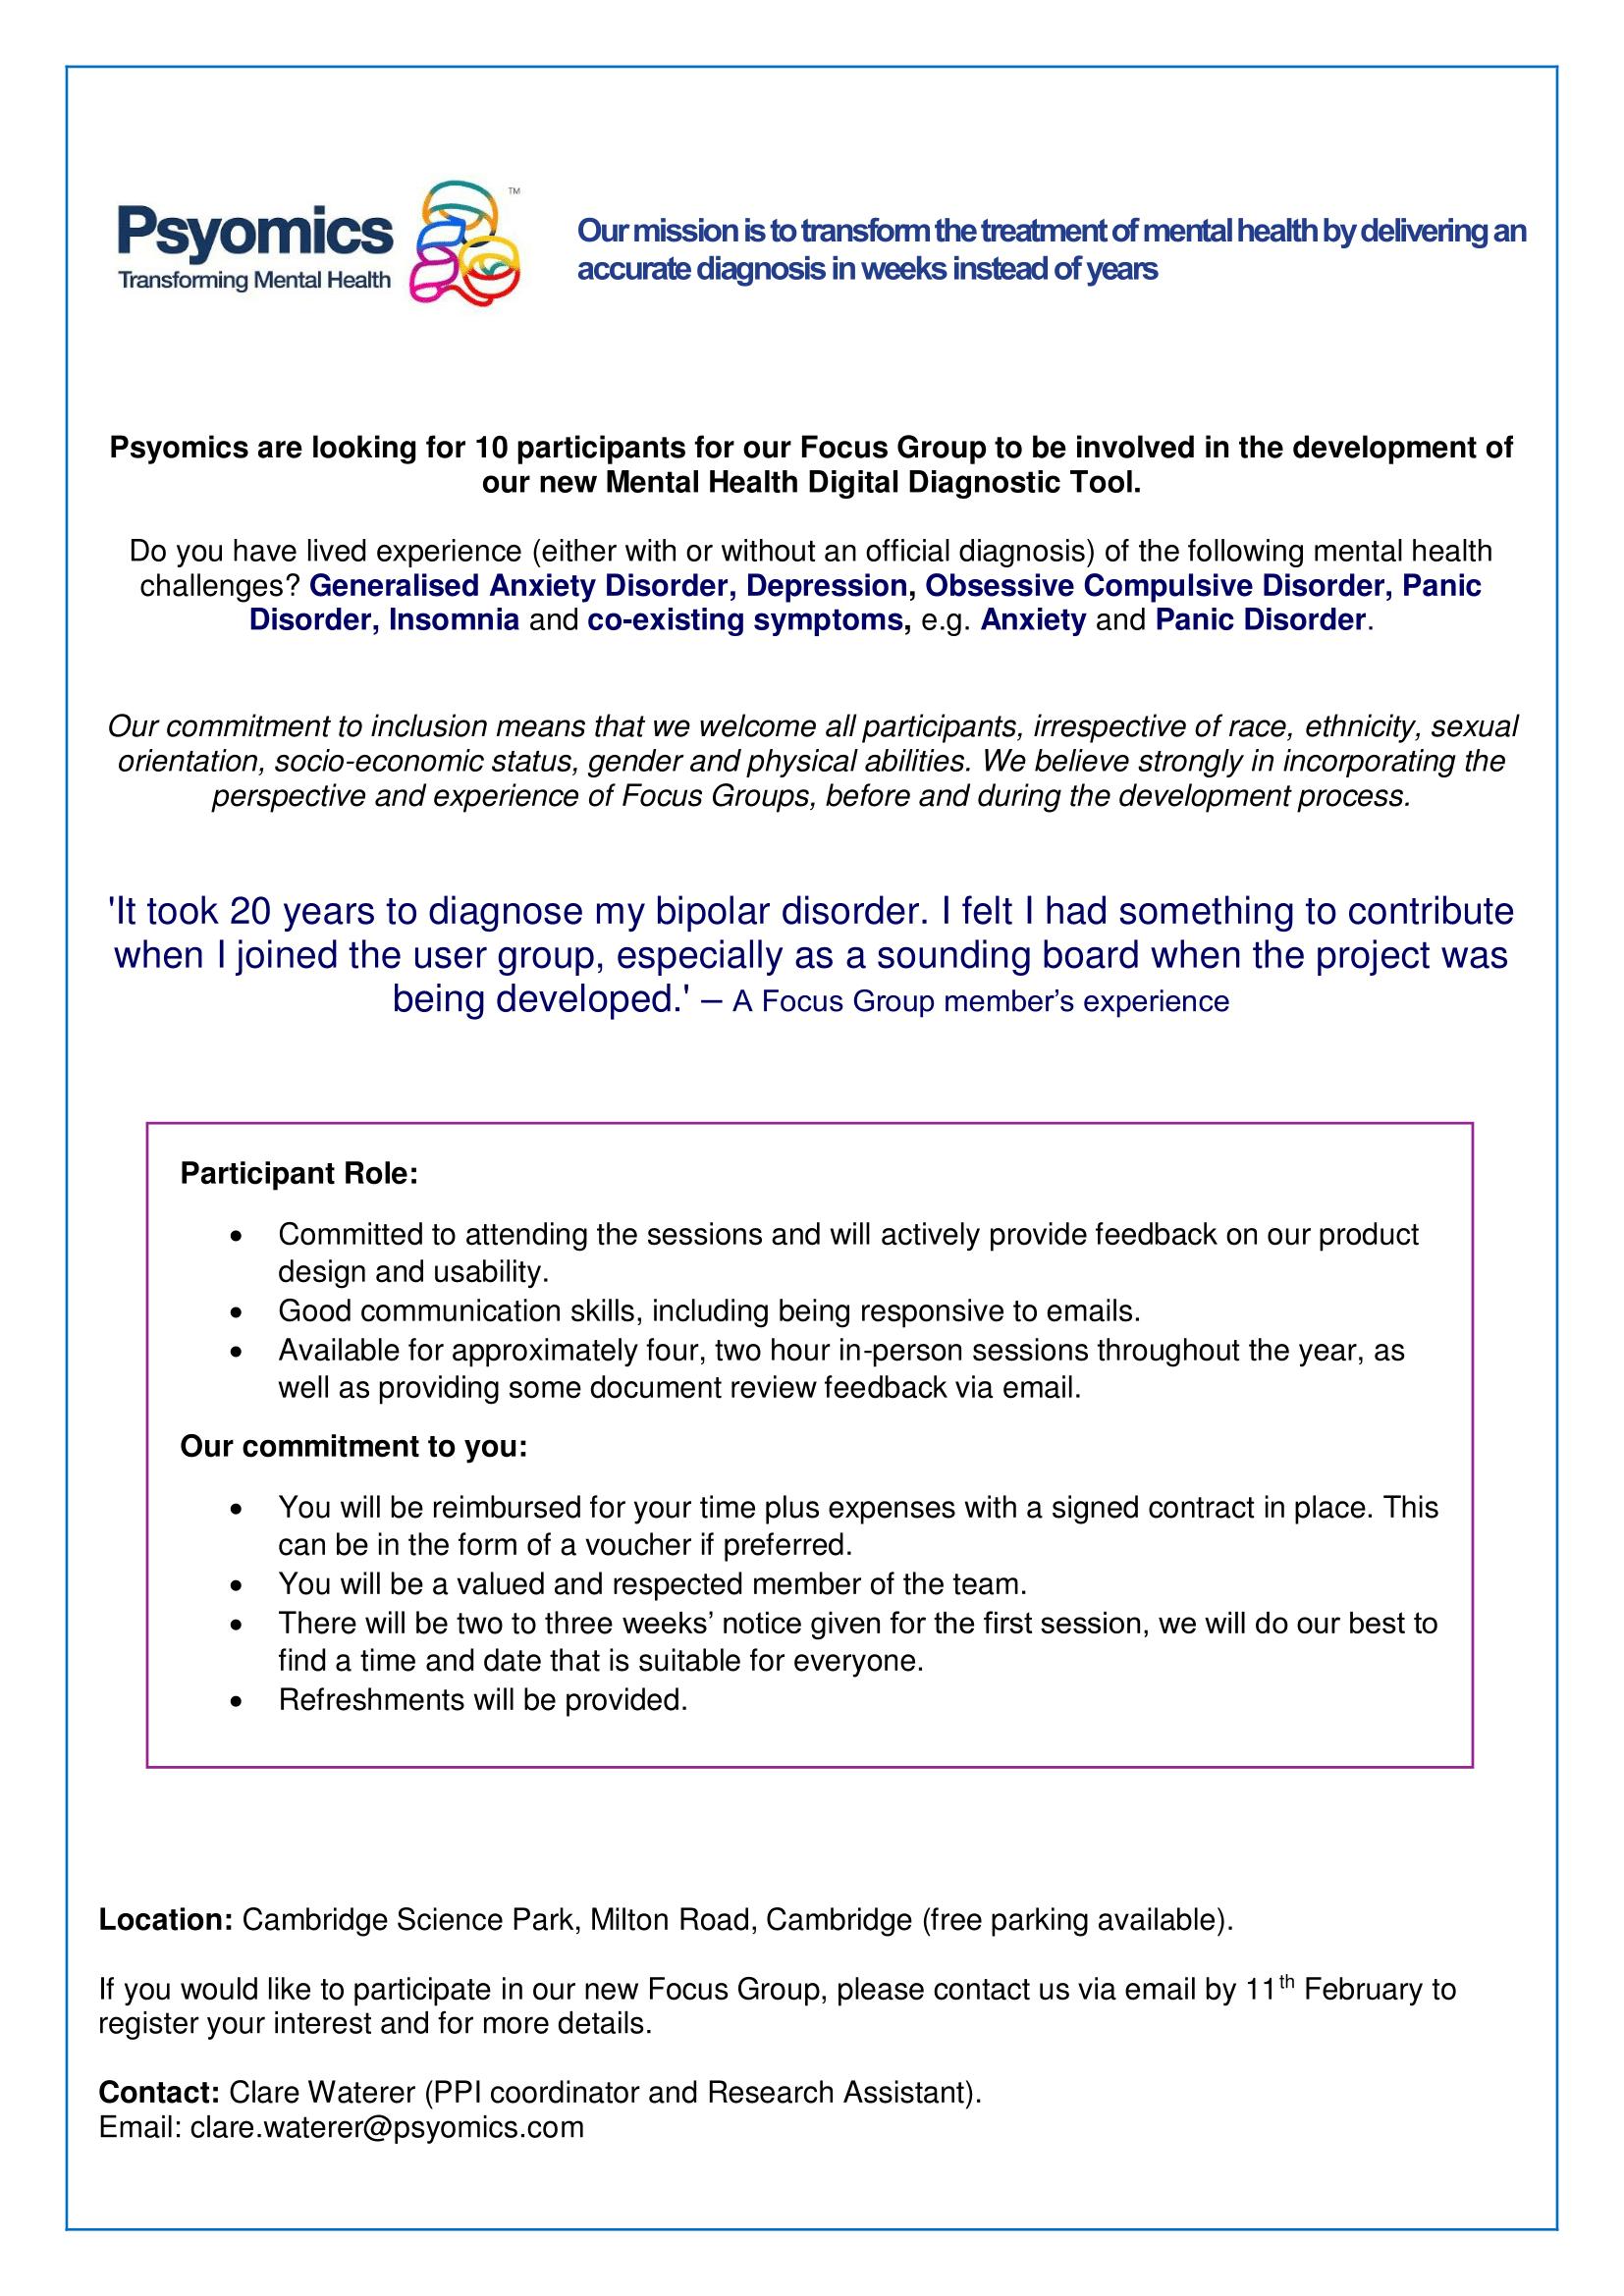 PPI Focus Group 2 Recruitment Poster-1